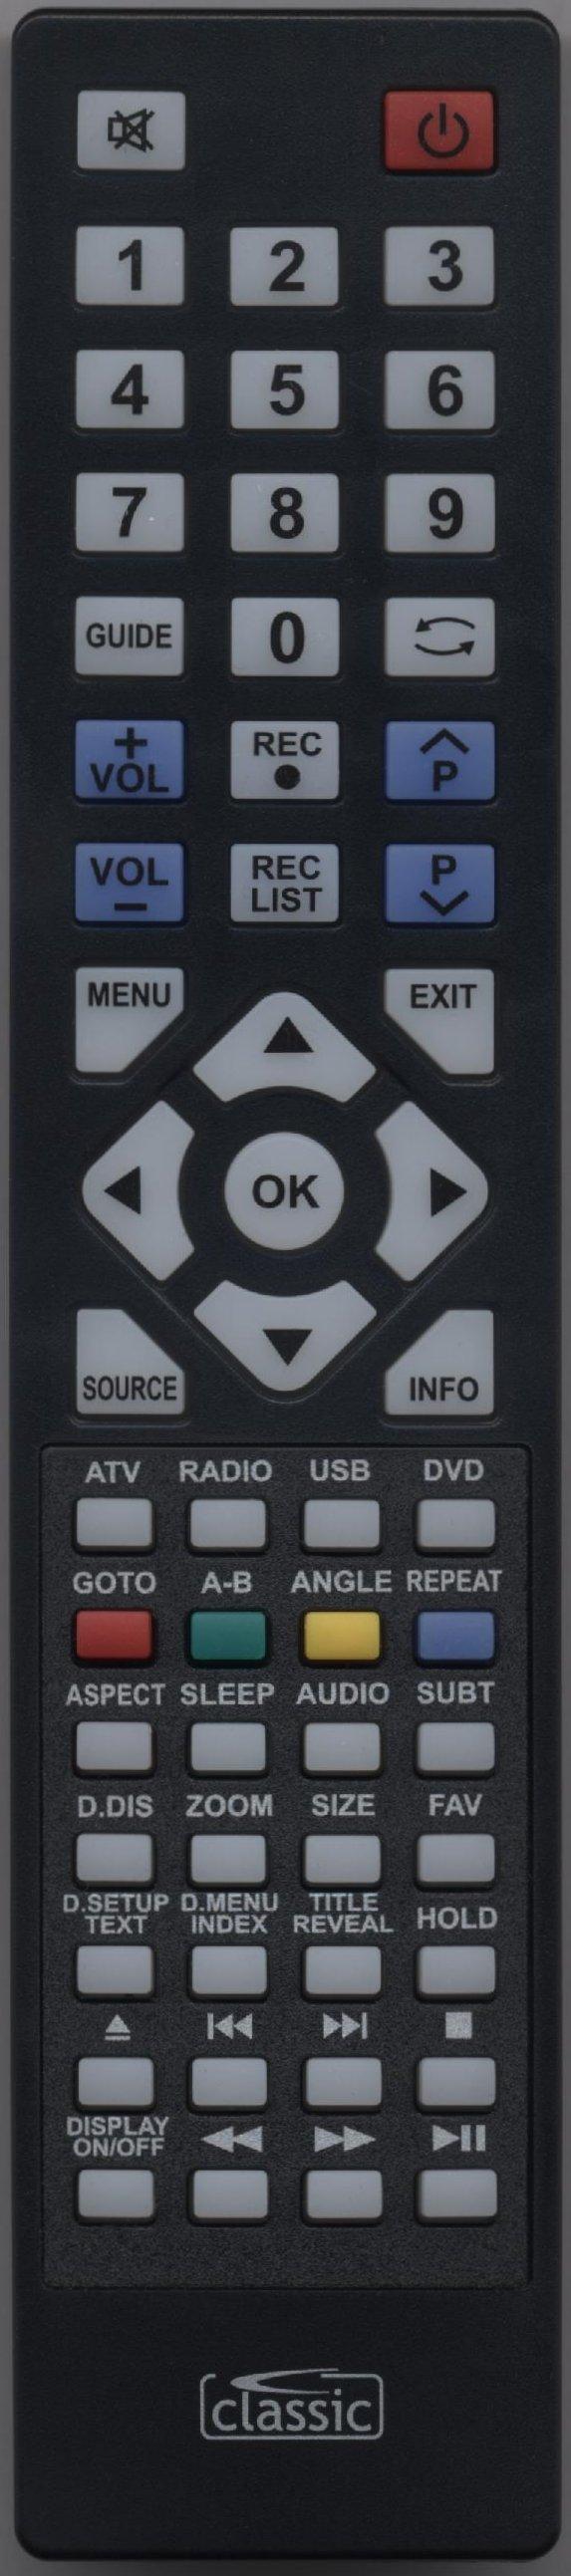 Blaupunkt X23/28G-GB-FTCDUP-UK Remote Control